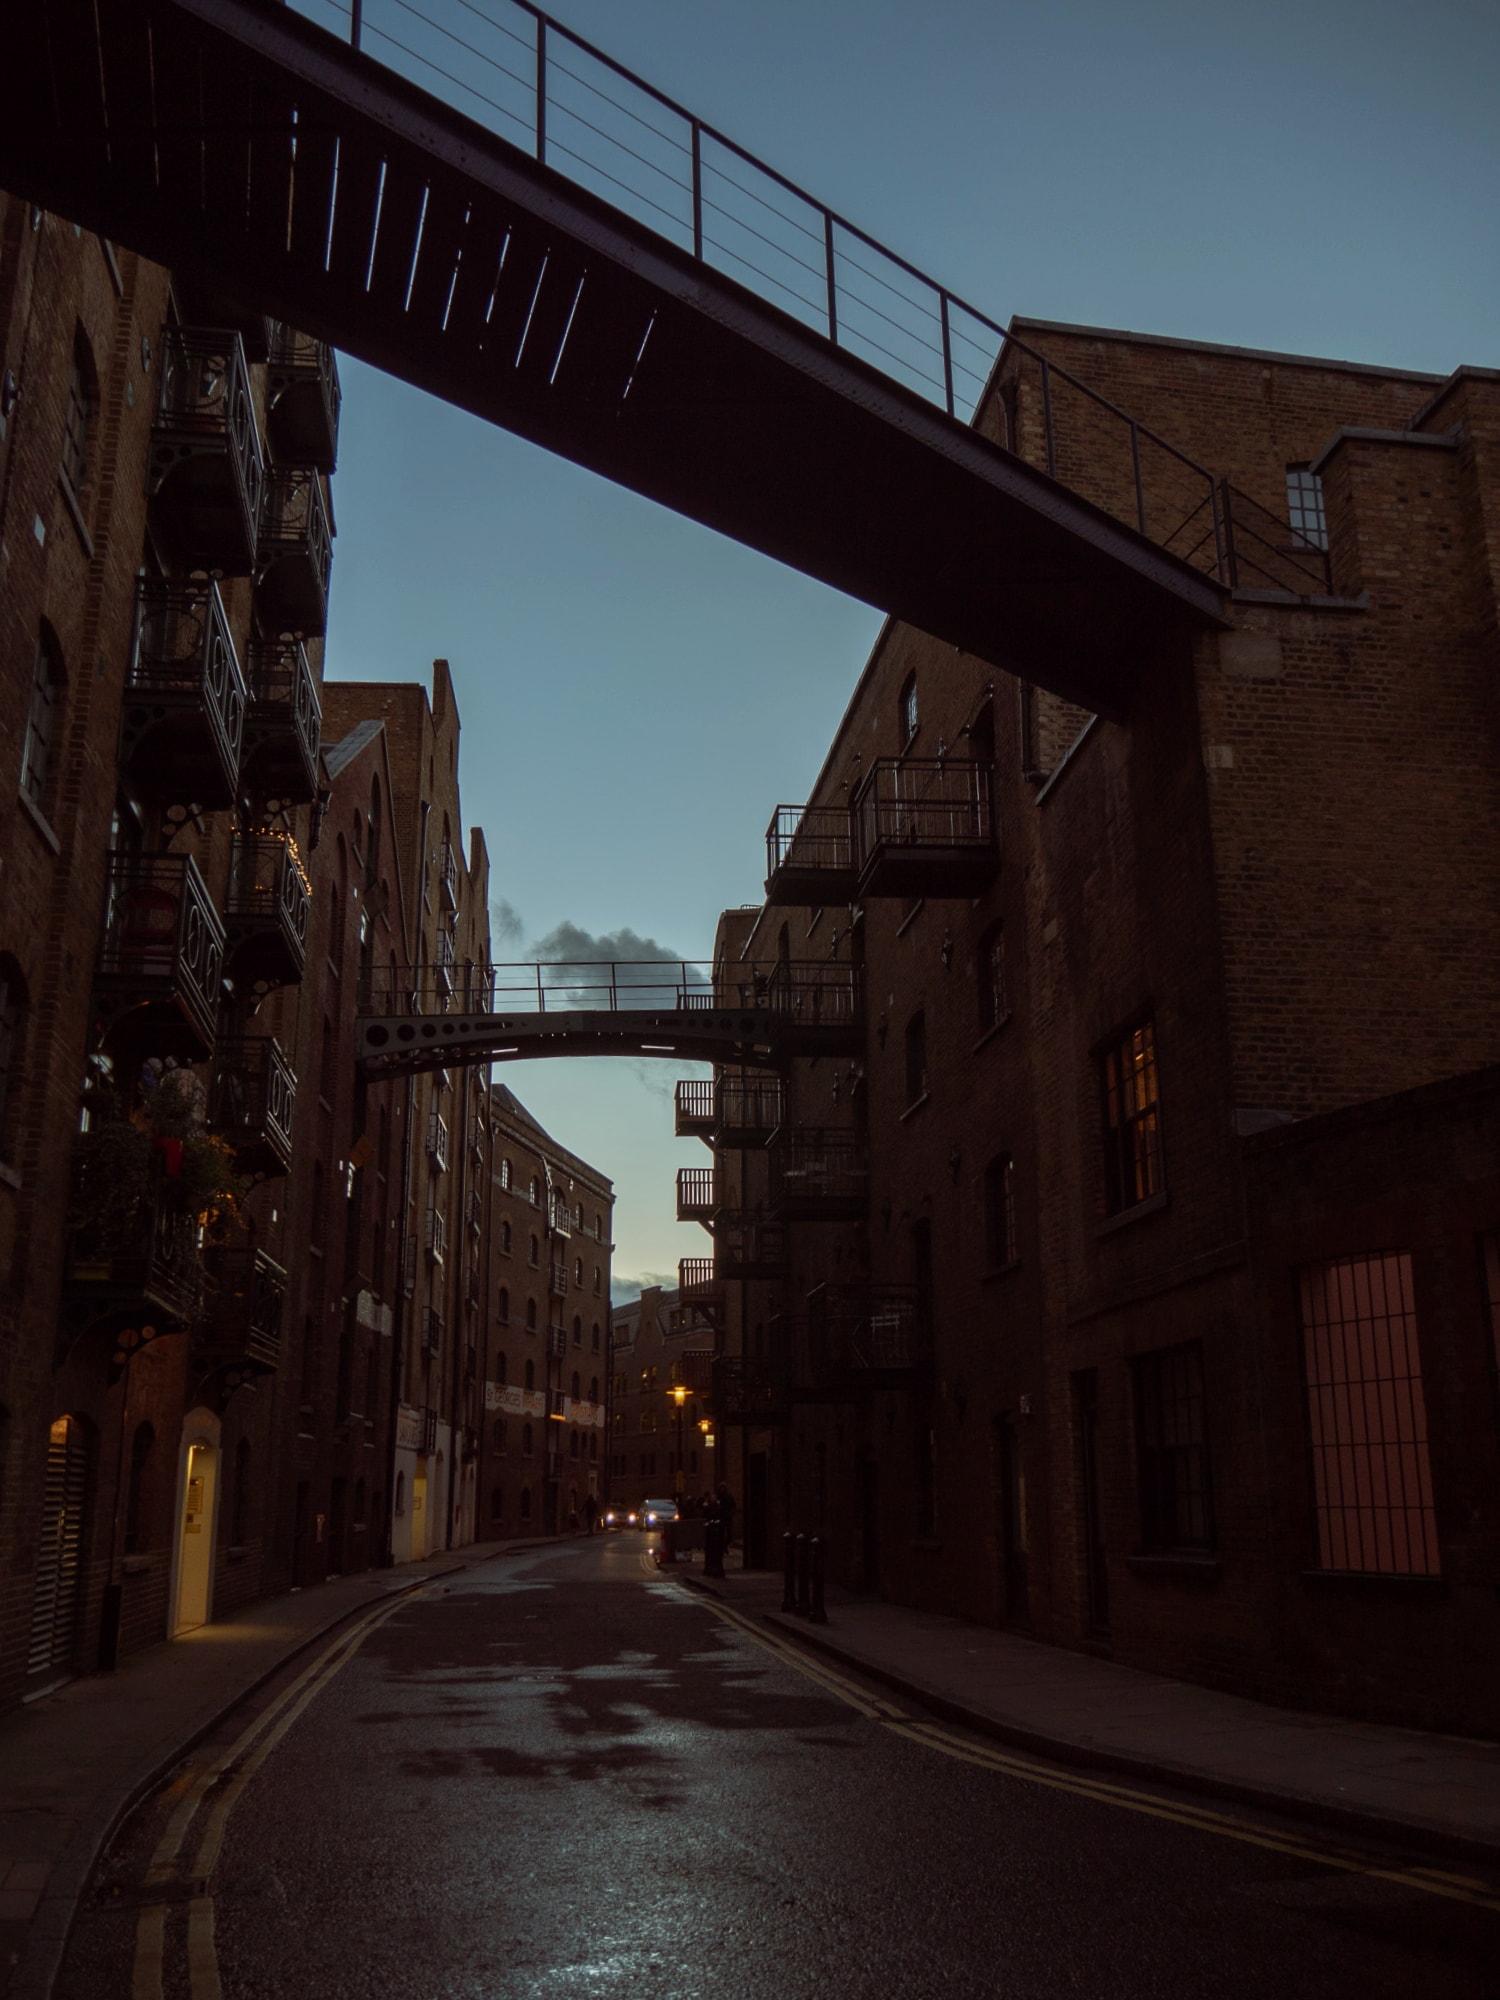 Framing streets